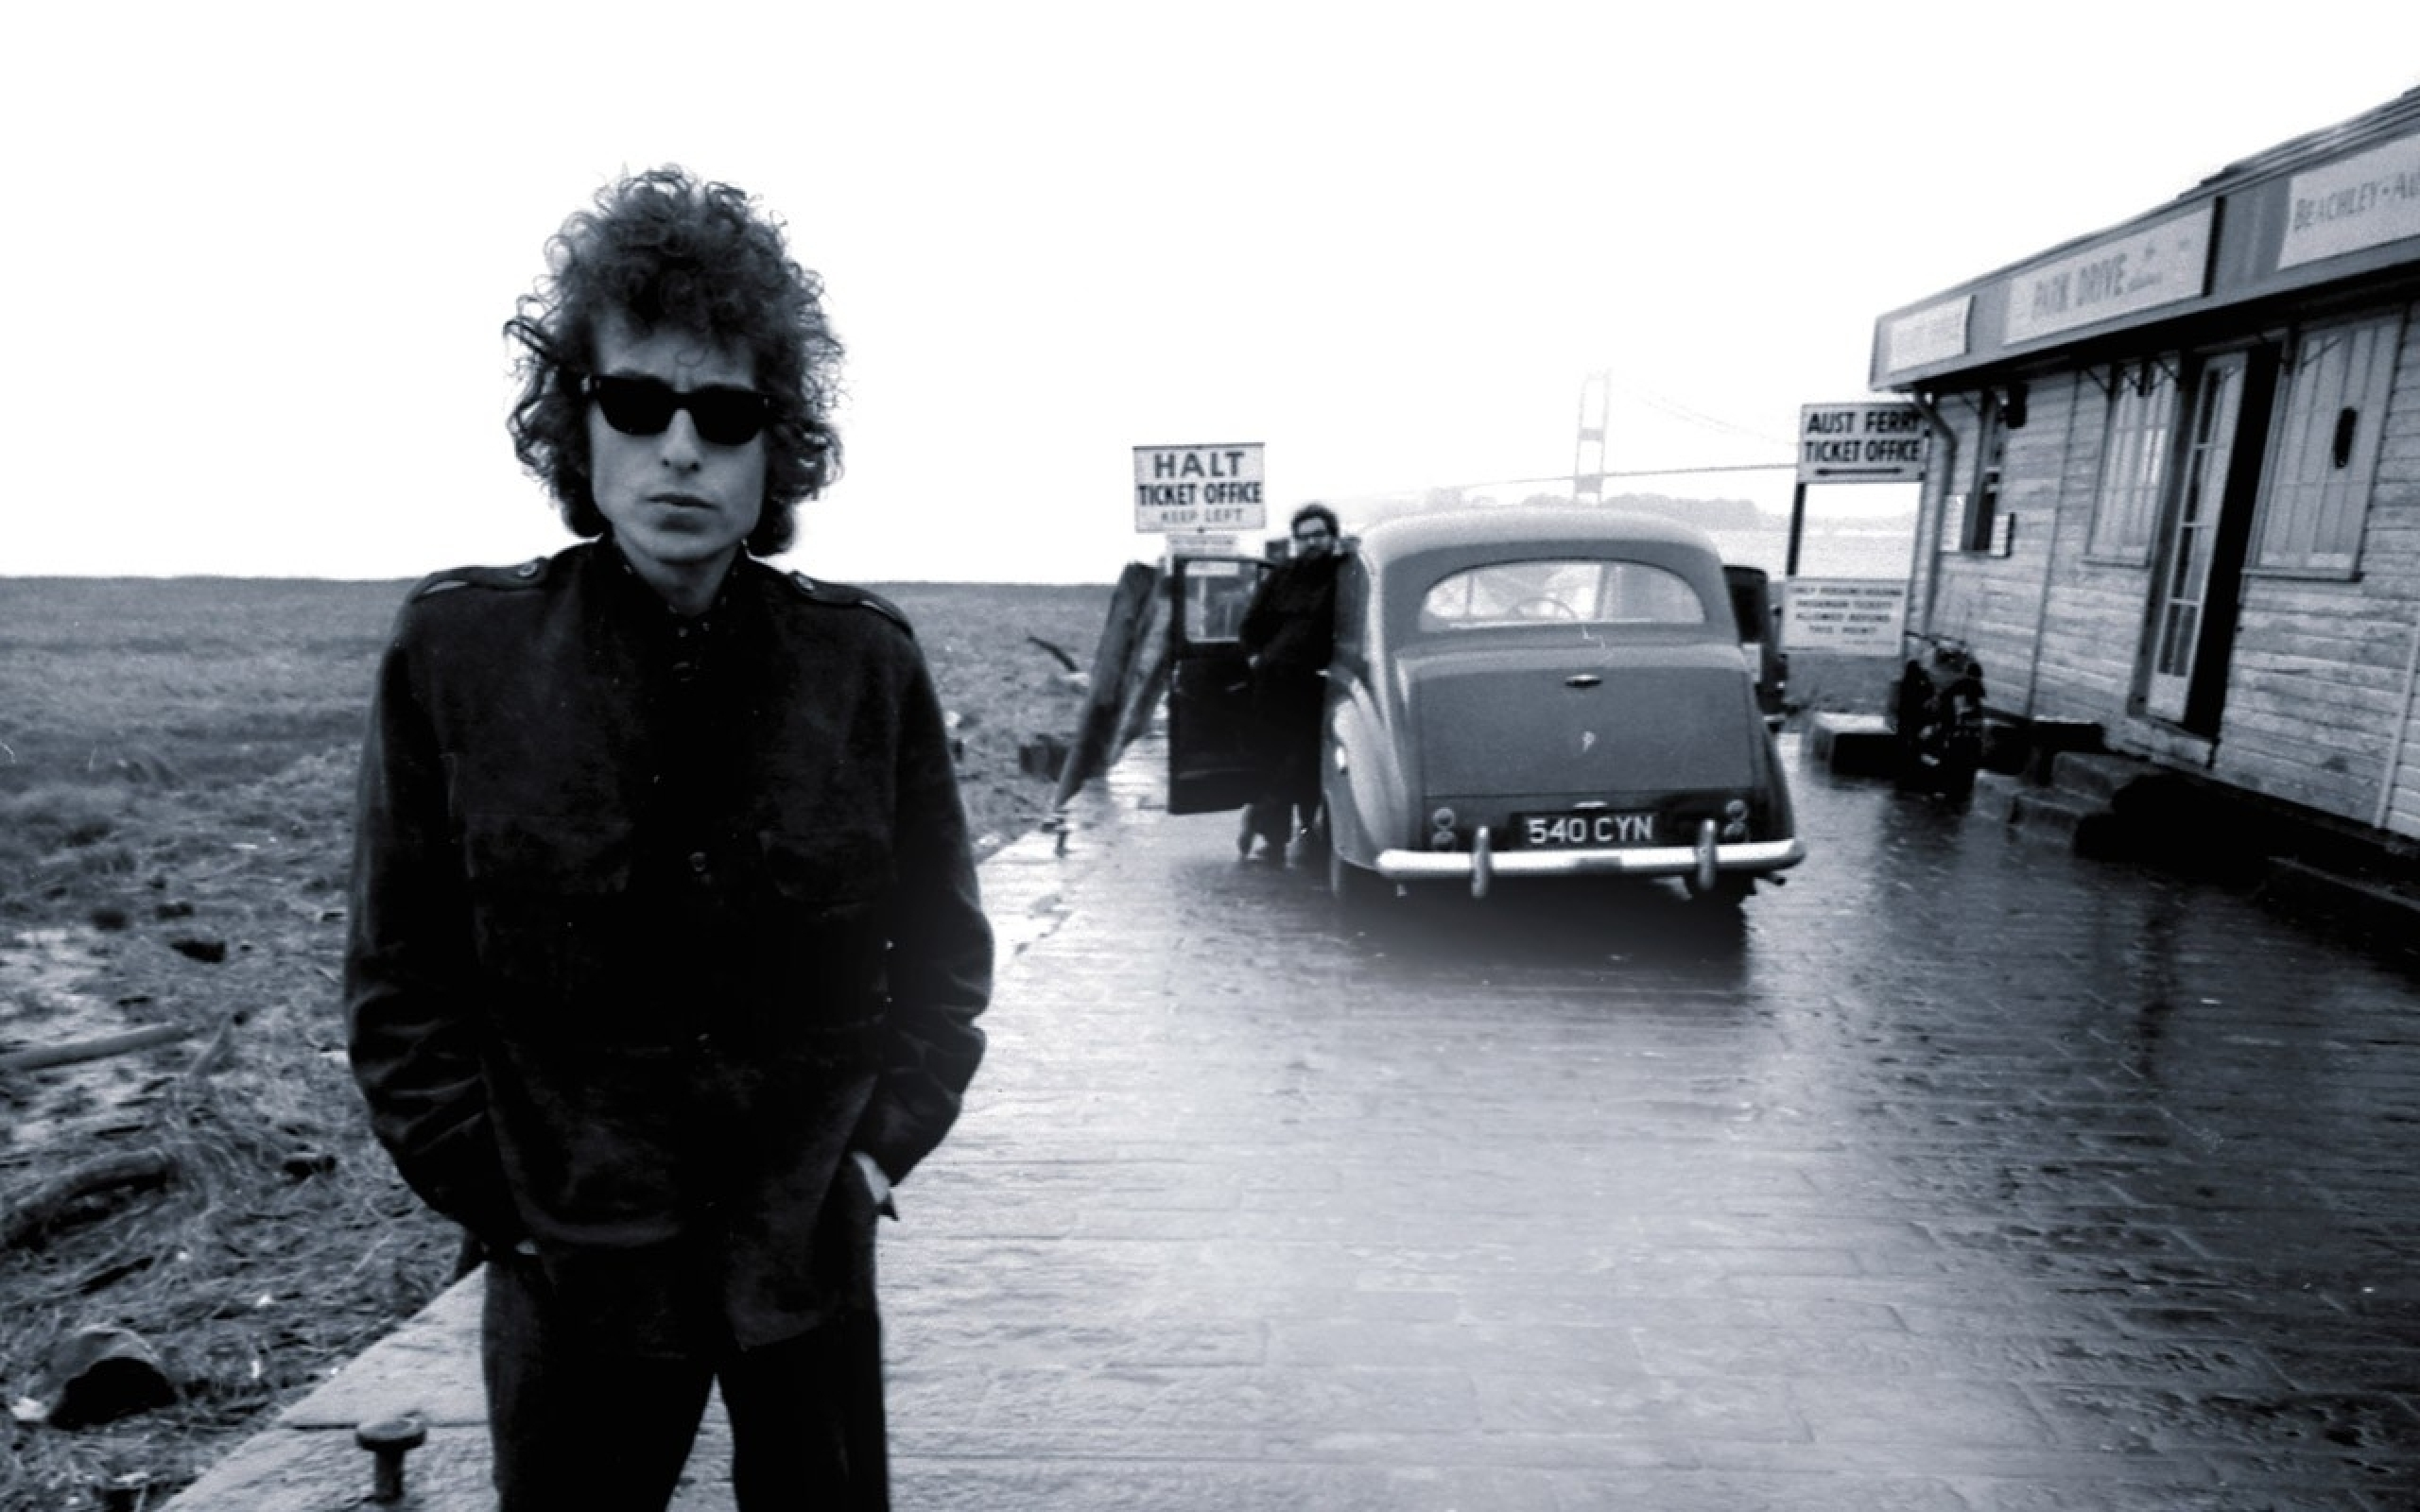 Боб Дилан обзор музыка протеста